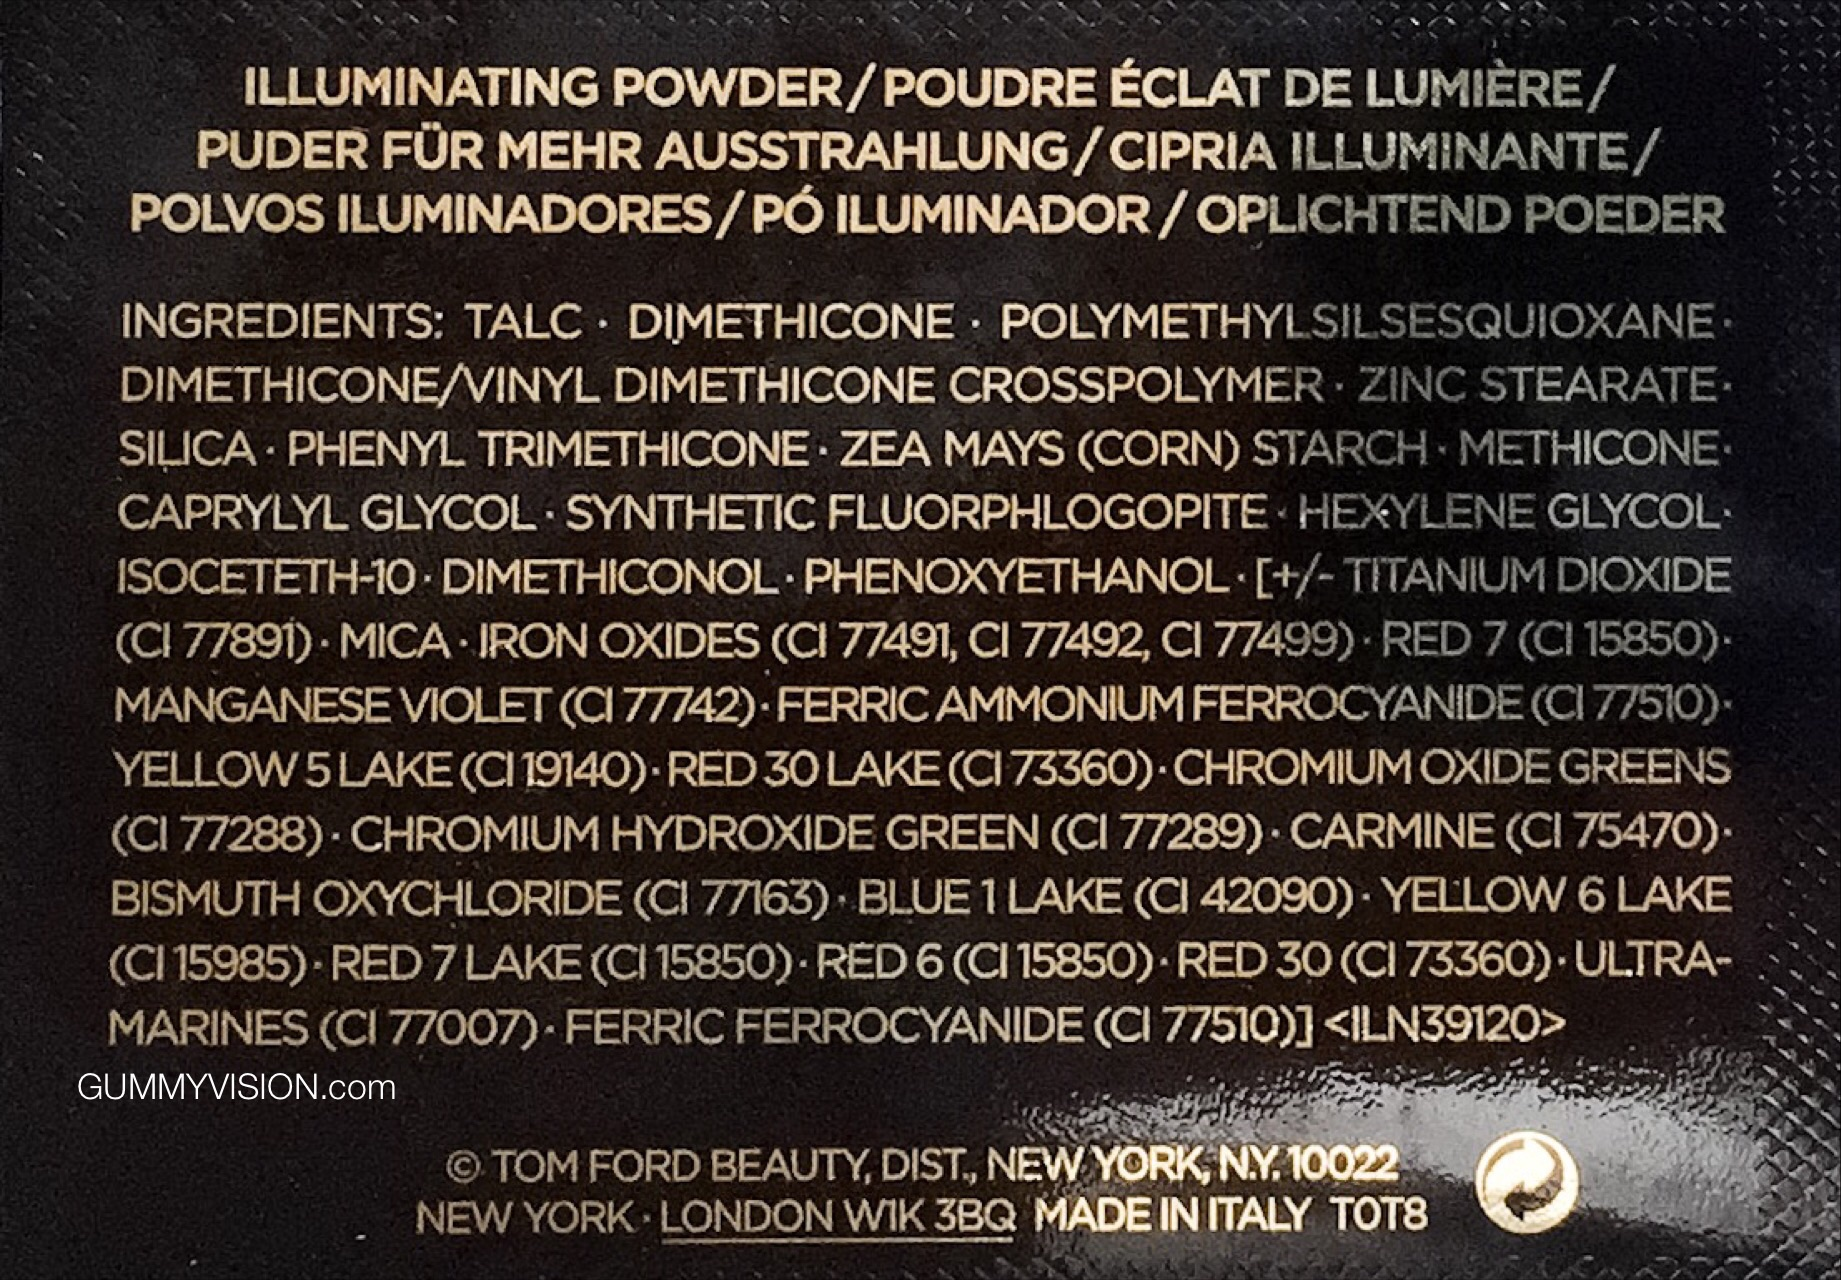 Tom Ford Illuminating Powder in Translucent Pink ingredients - gummyvision.com